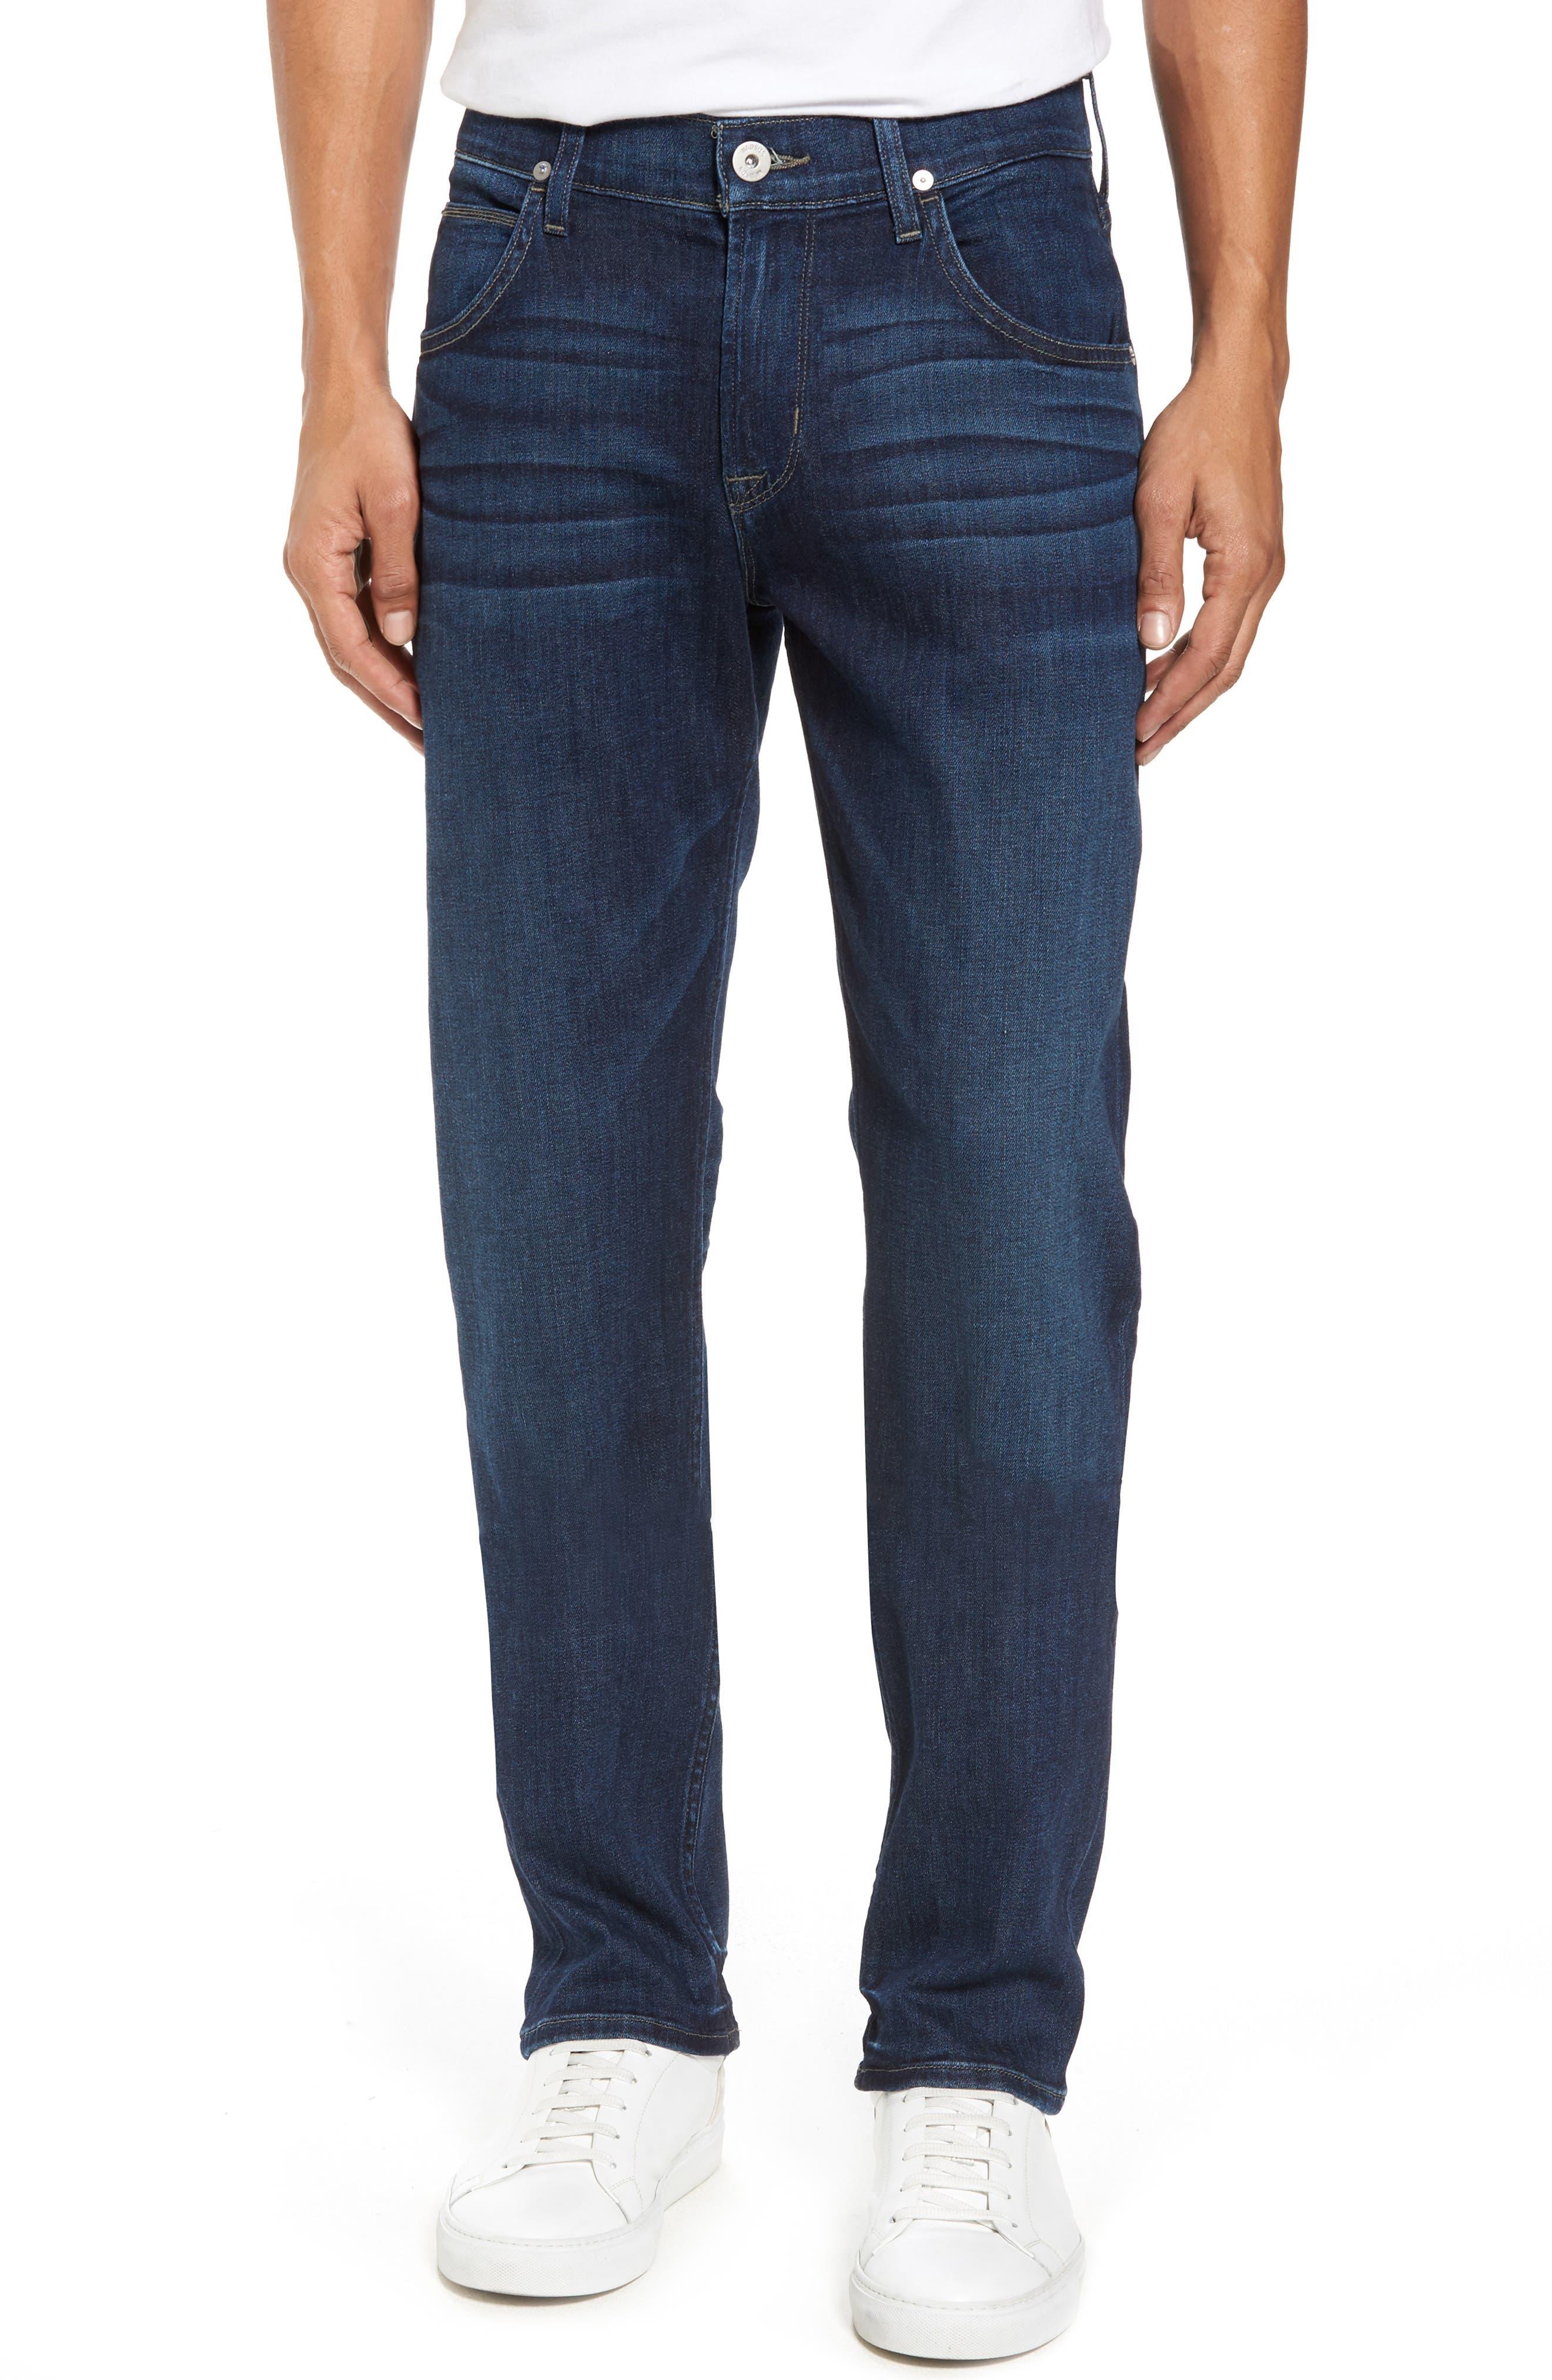 Main Image - Hudson Jeans Byron Slim Straight Fit Jeans (Draper)